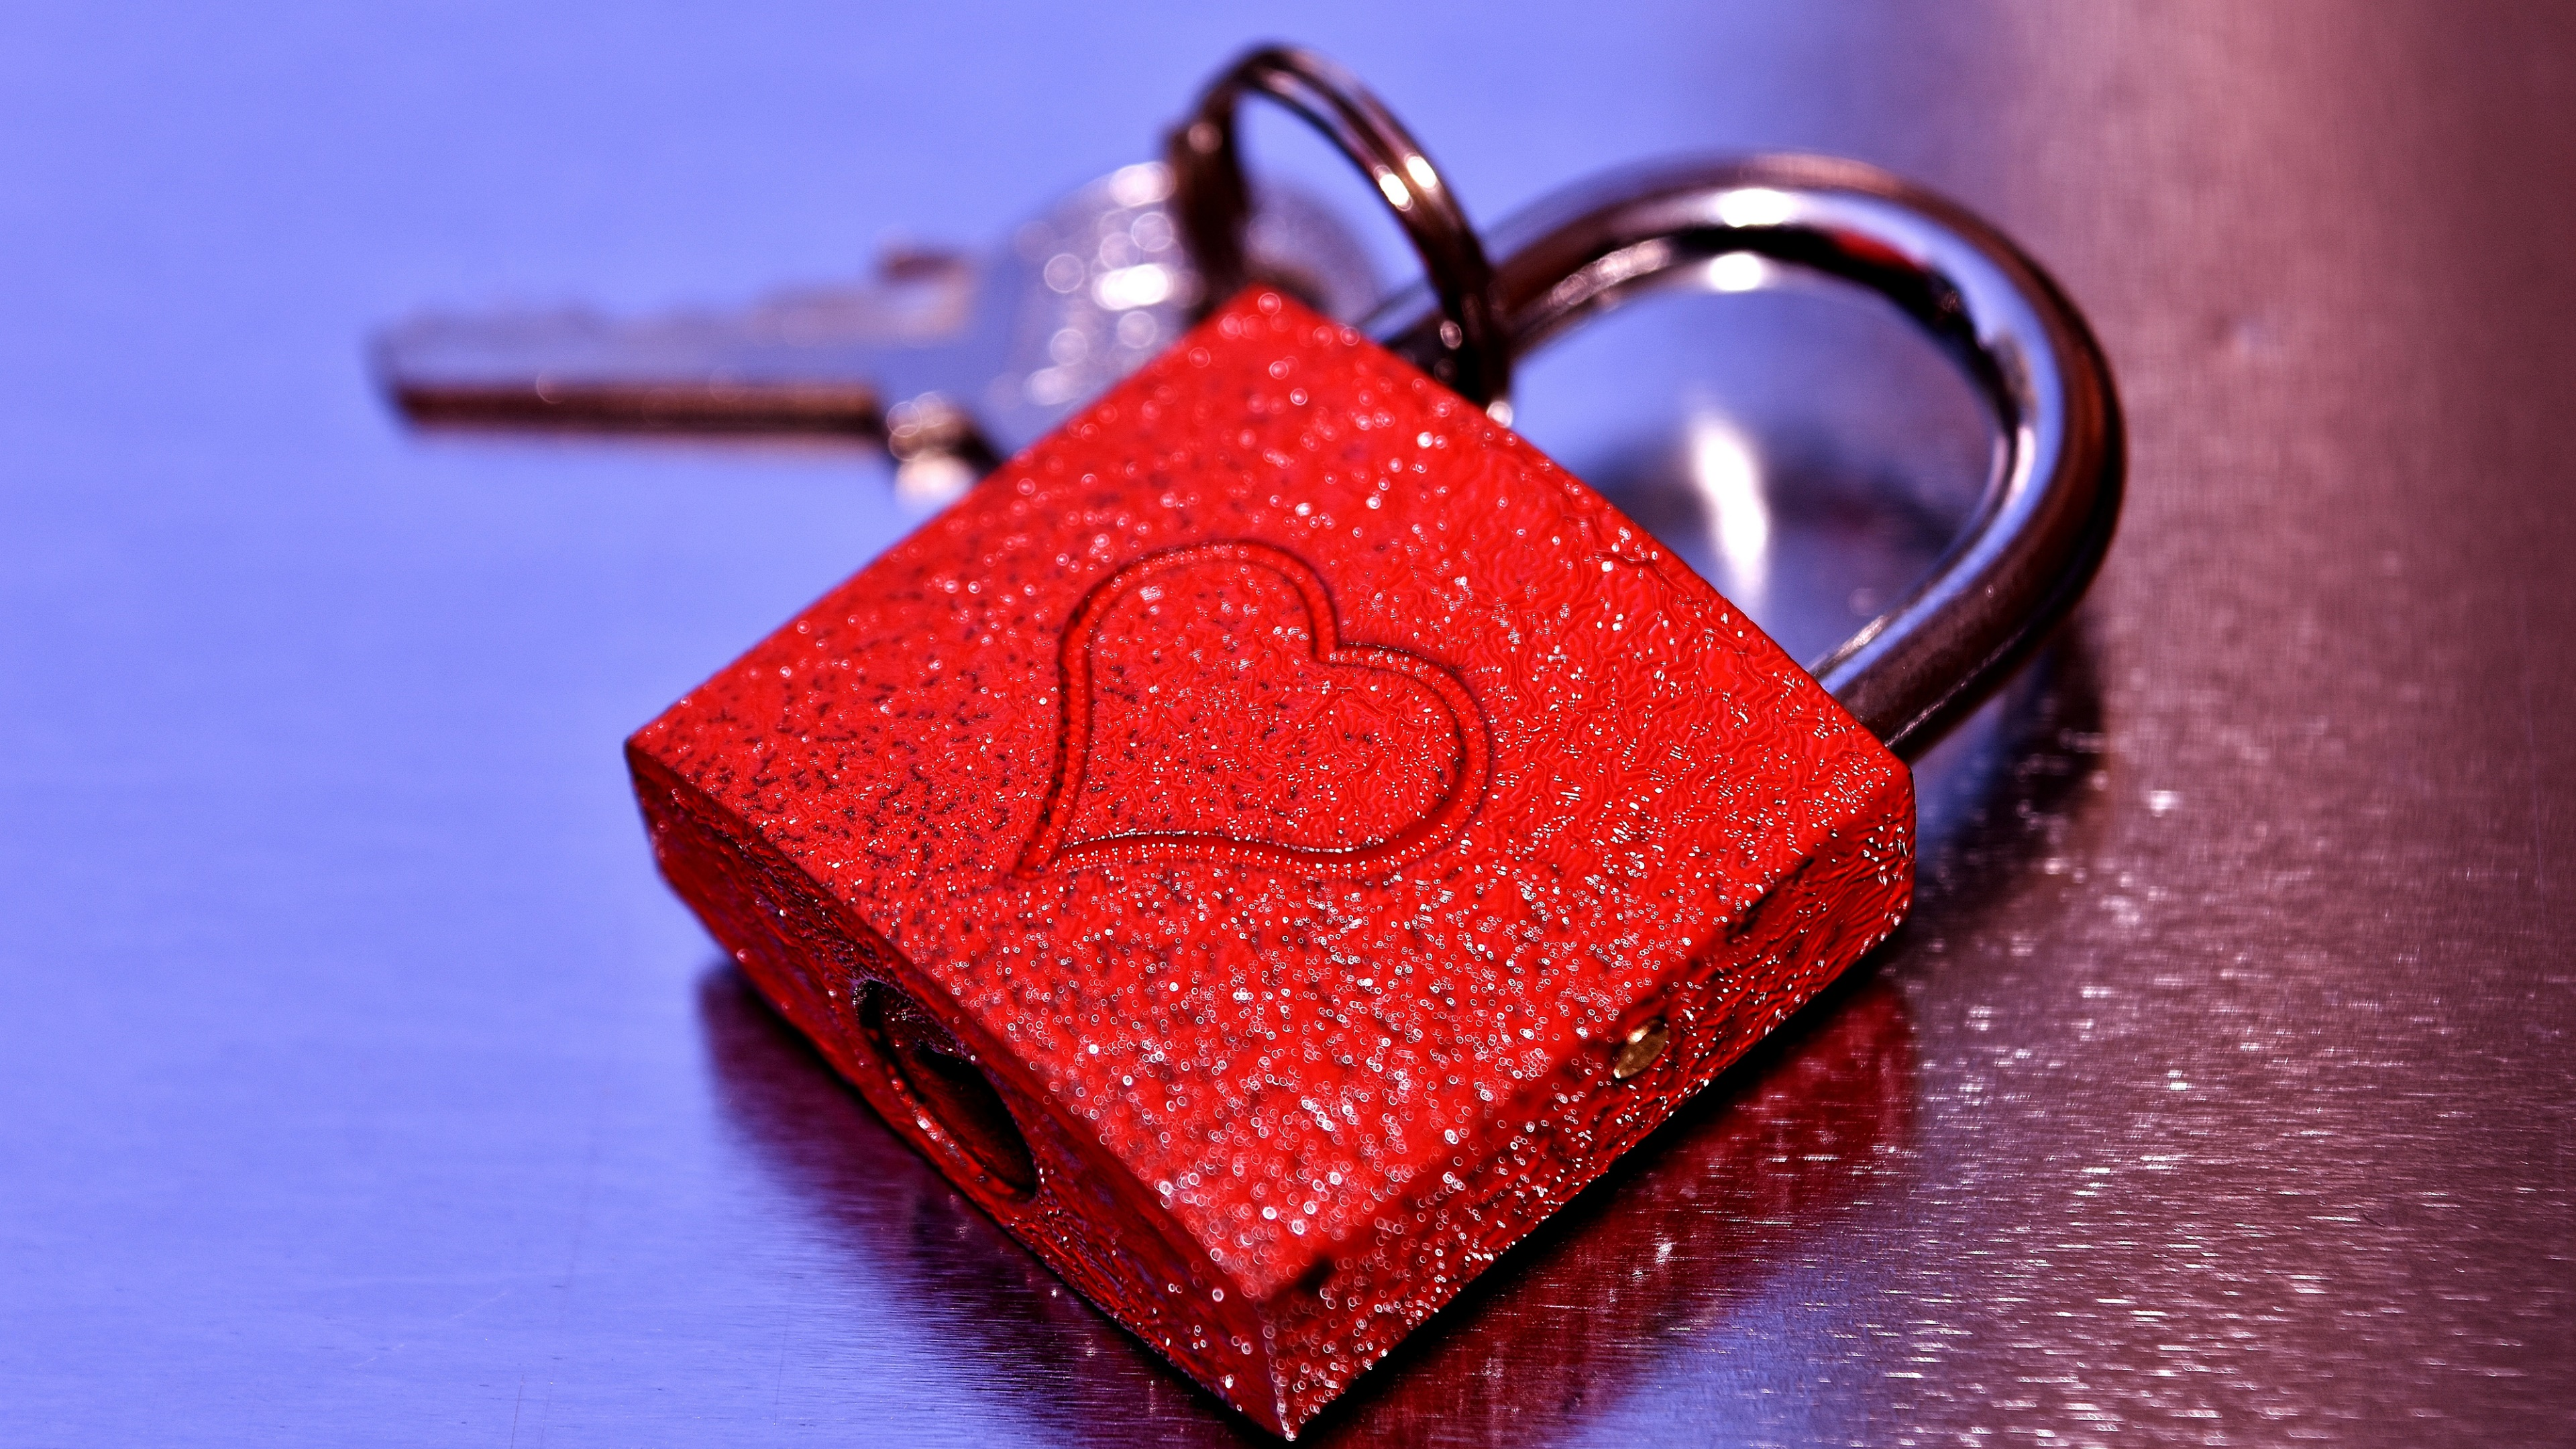 Love-heart padlock wallpaper